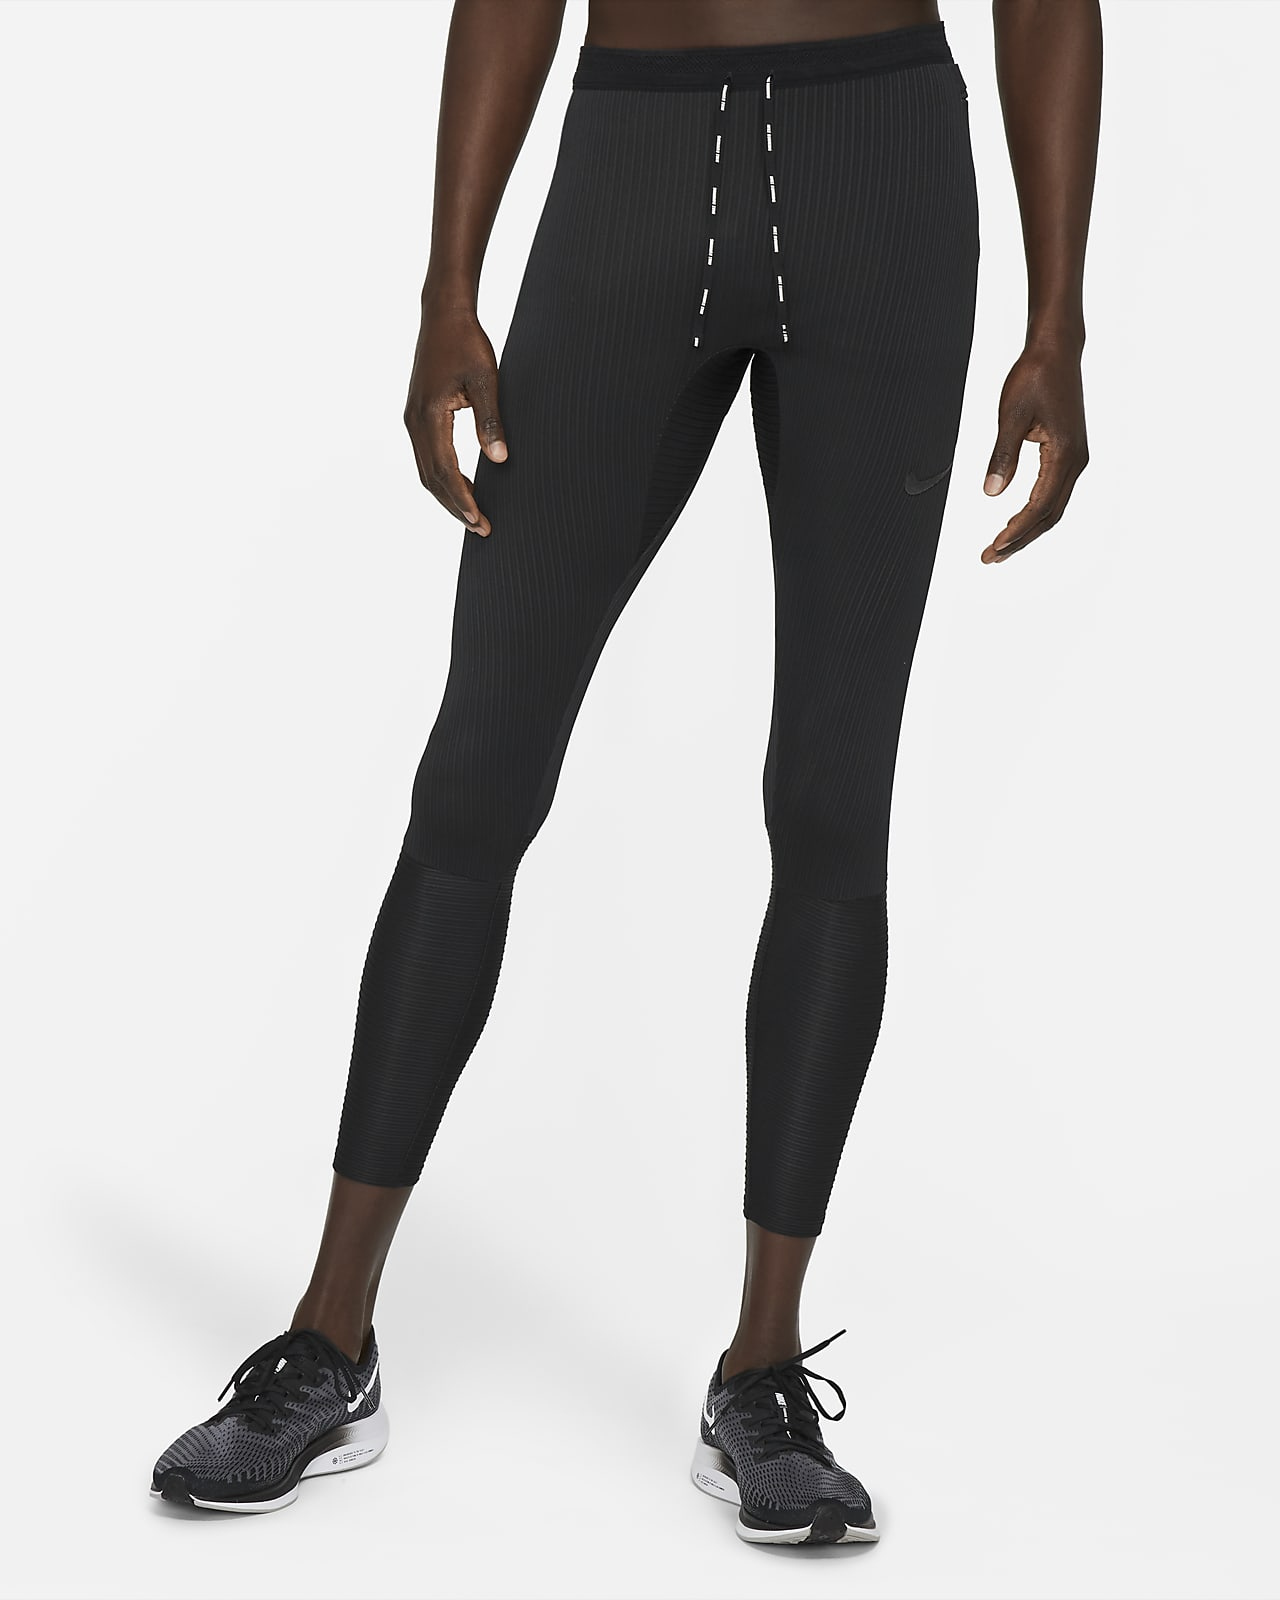 Мужские беговые тайтсы Nike Dri-FIT Swift